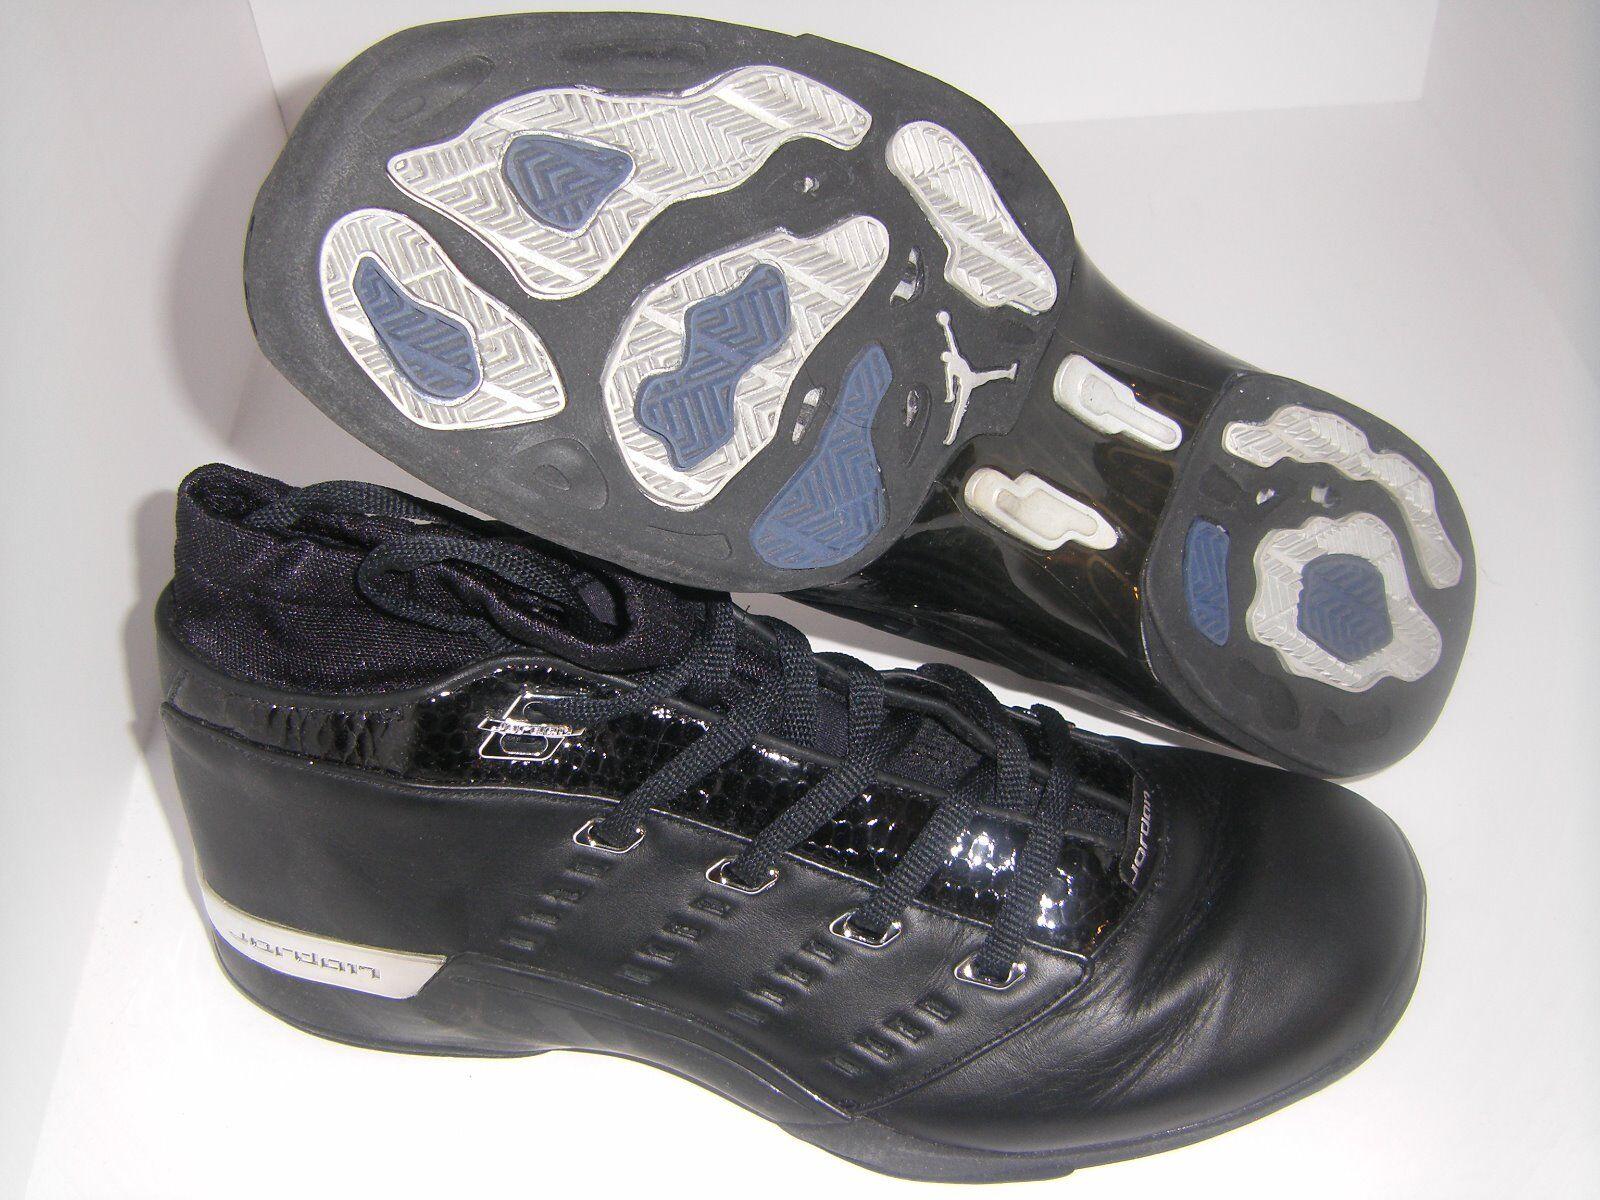 Pre-owned eccellente scarpe delle nike air jordan xvii 17 basket scarpe eccellente uomini sz 13 aa3450